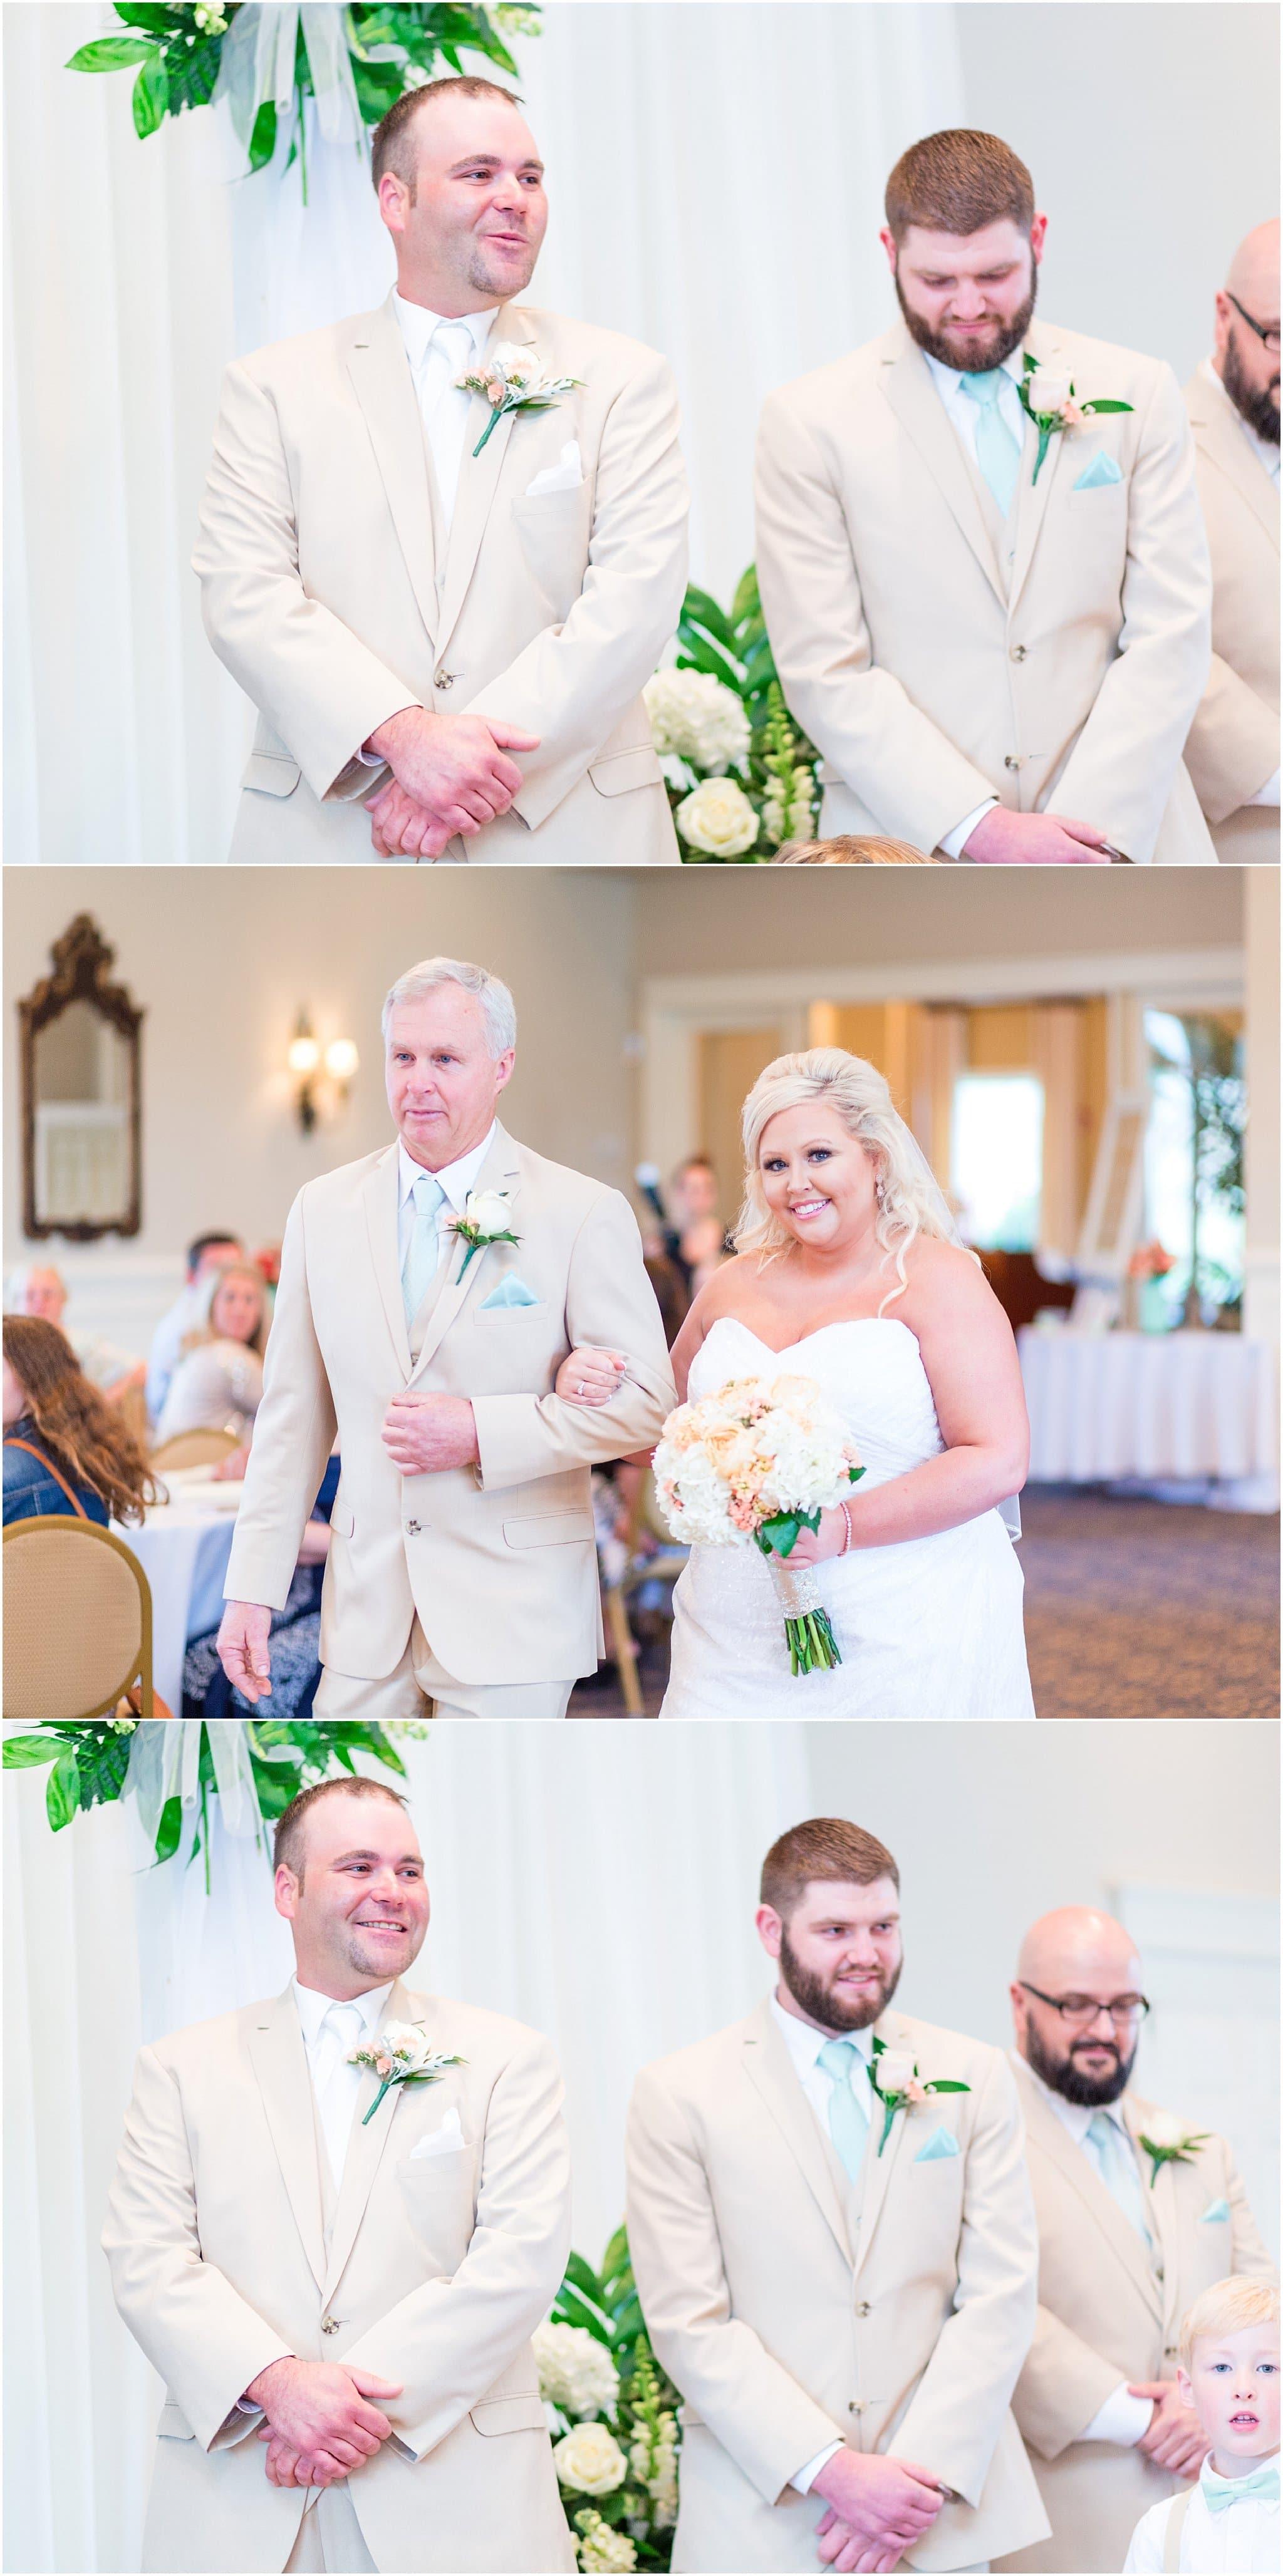 jessscott-milsboro-delaware-wedding-cassidymrphotography_0049